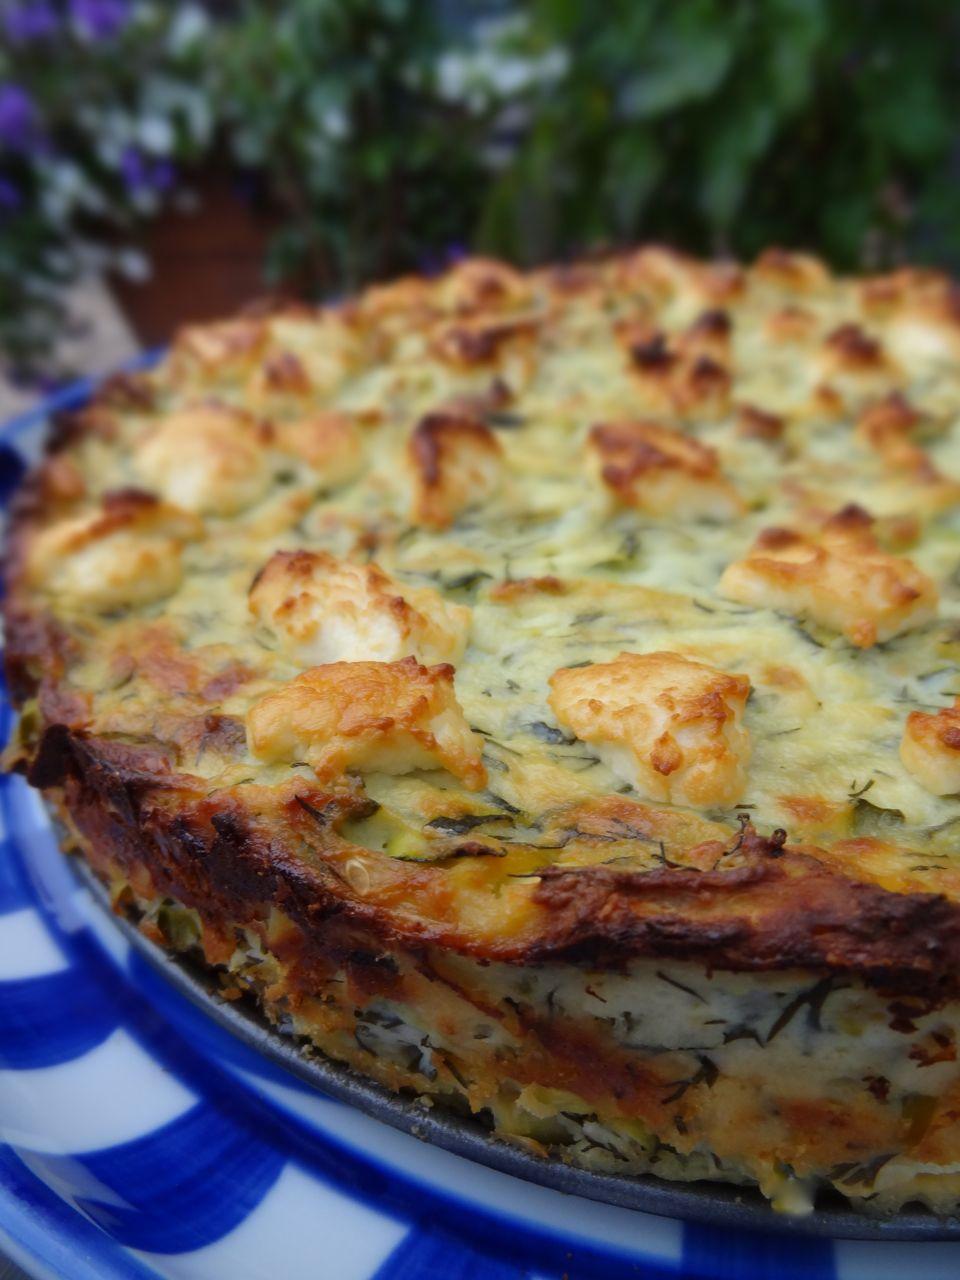 Scrumpdillyicious: Zucchini Ricotta Savoury Cheesecake